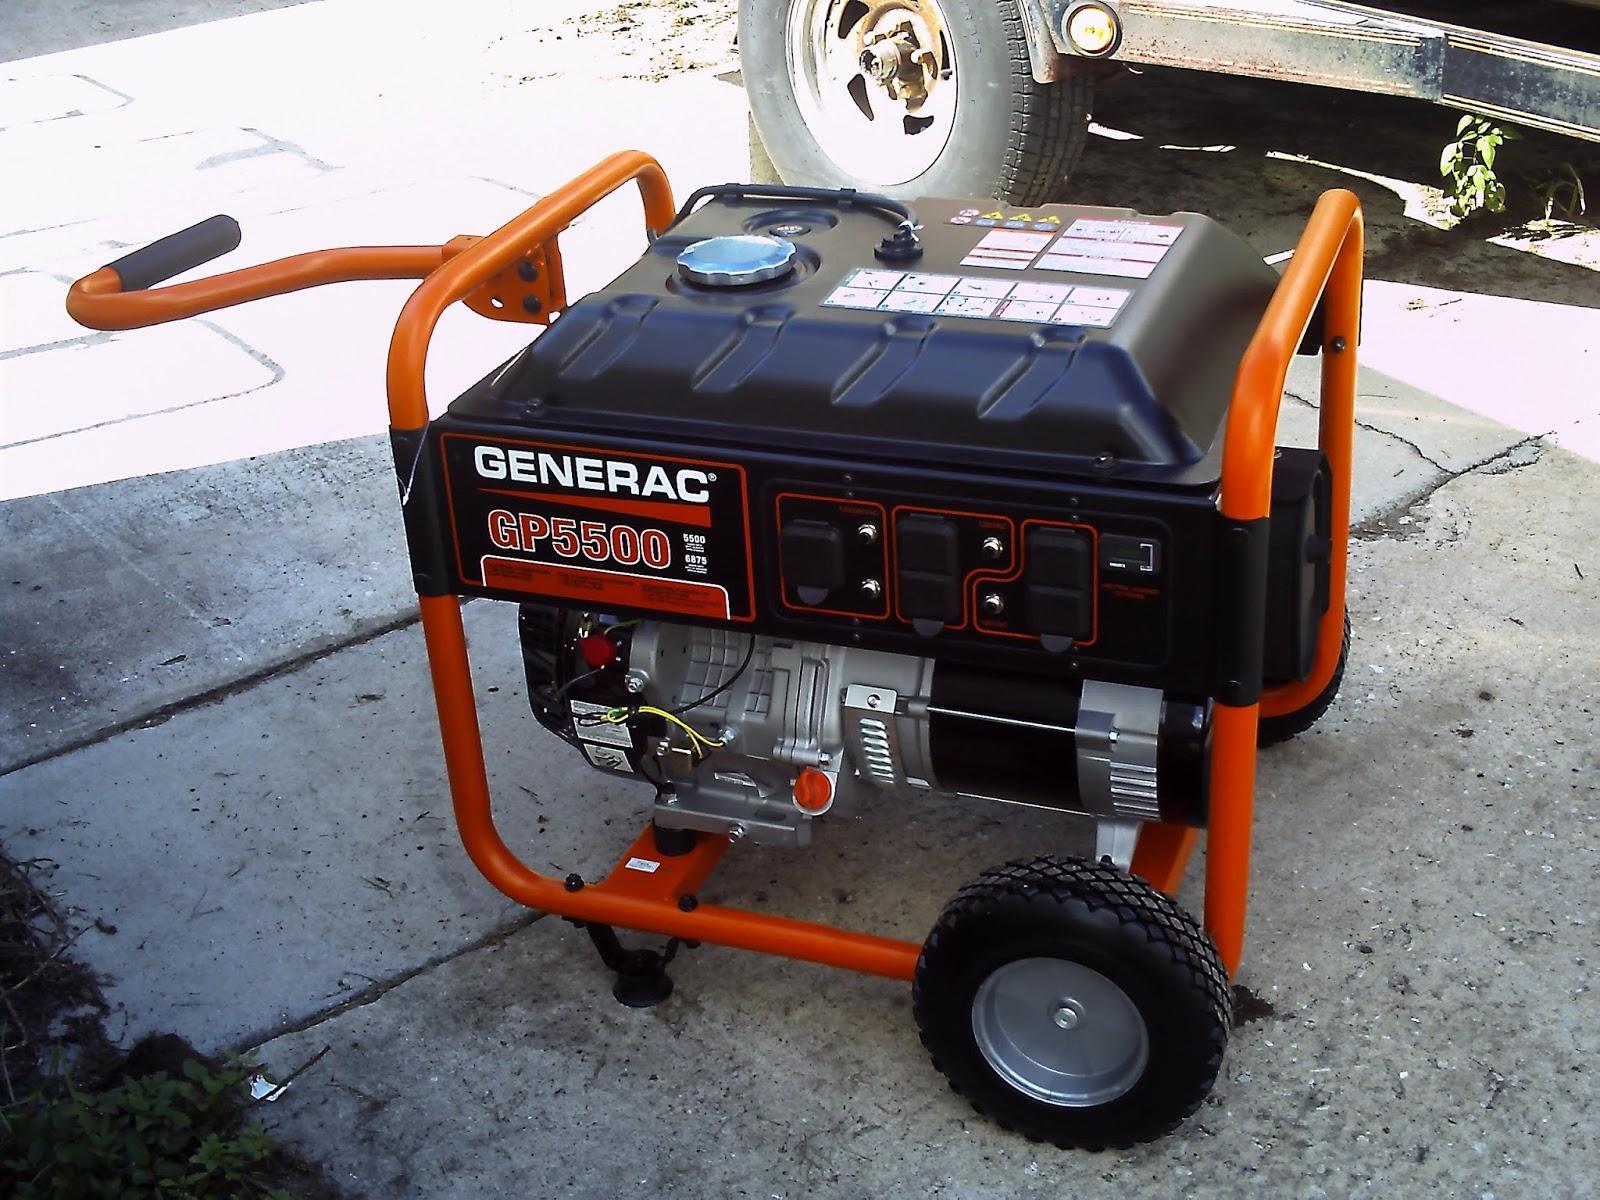 Terry s Small Engine Repair Generac GP5500 Portable Generator